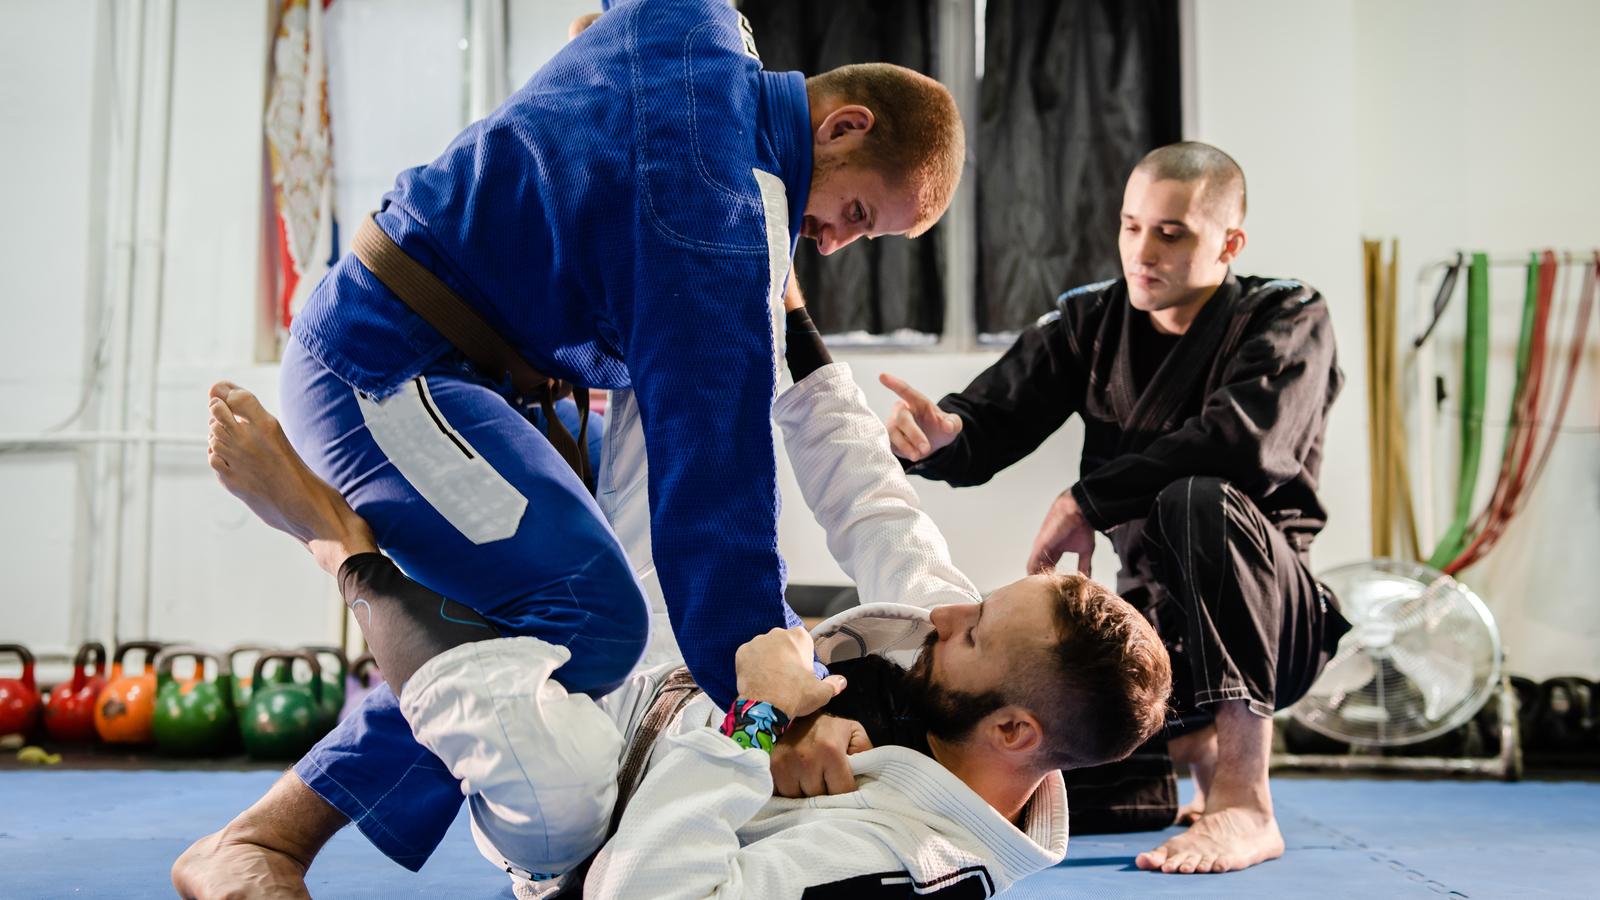 Beginner Jiu Jitsu in Greater St. Louis, MO